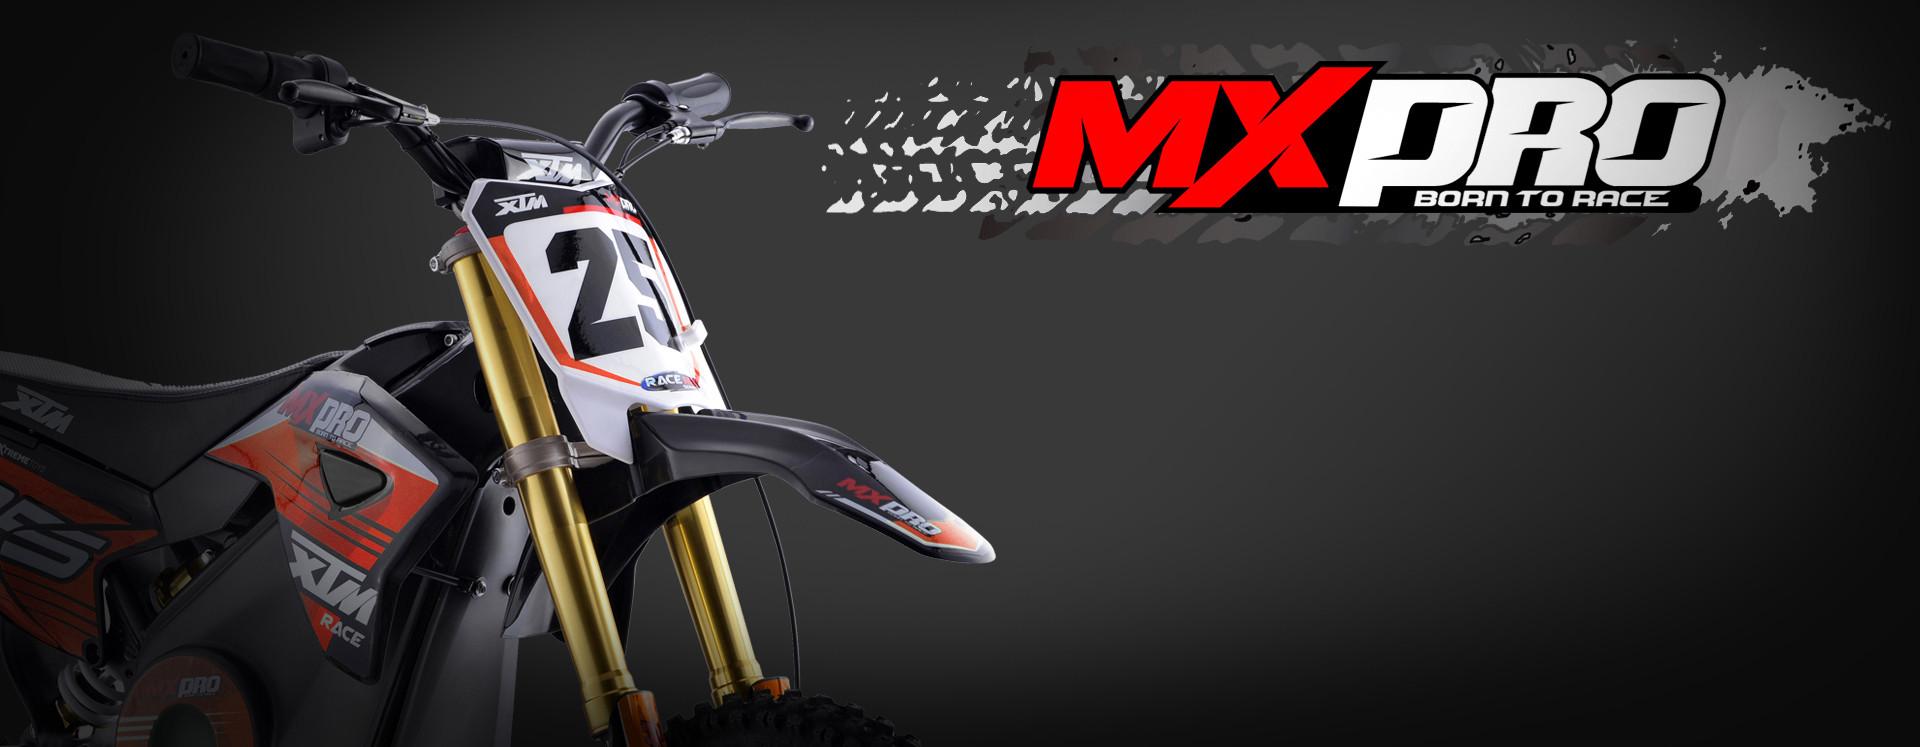 XTM MX-PRO 48V 1300W BIG WHEEL 14/12 LITHIUM DIRT BIKE ORANGE